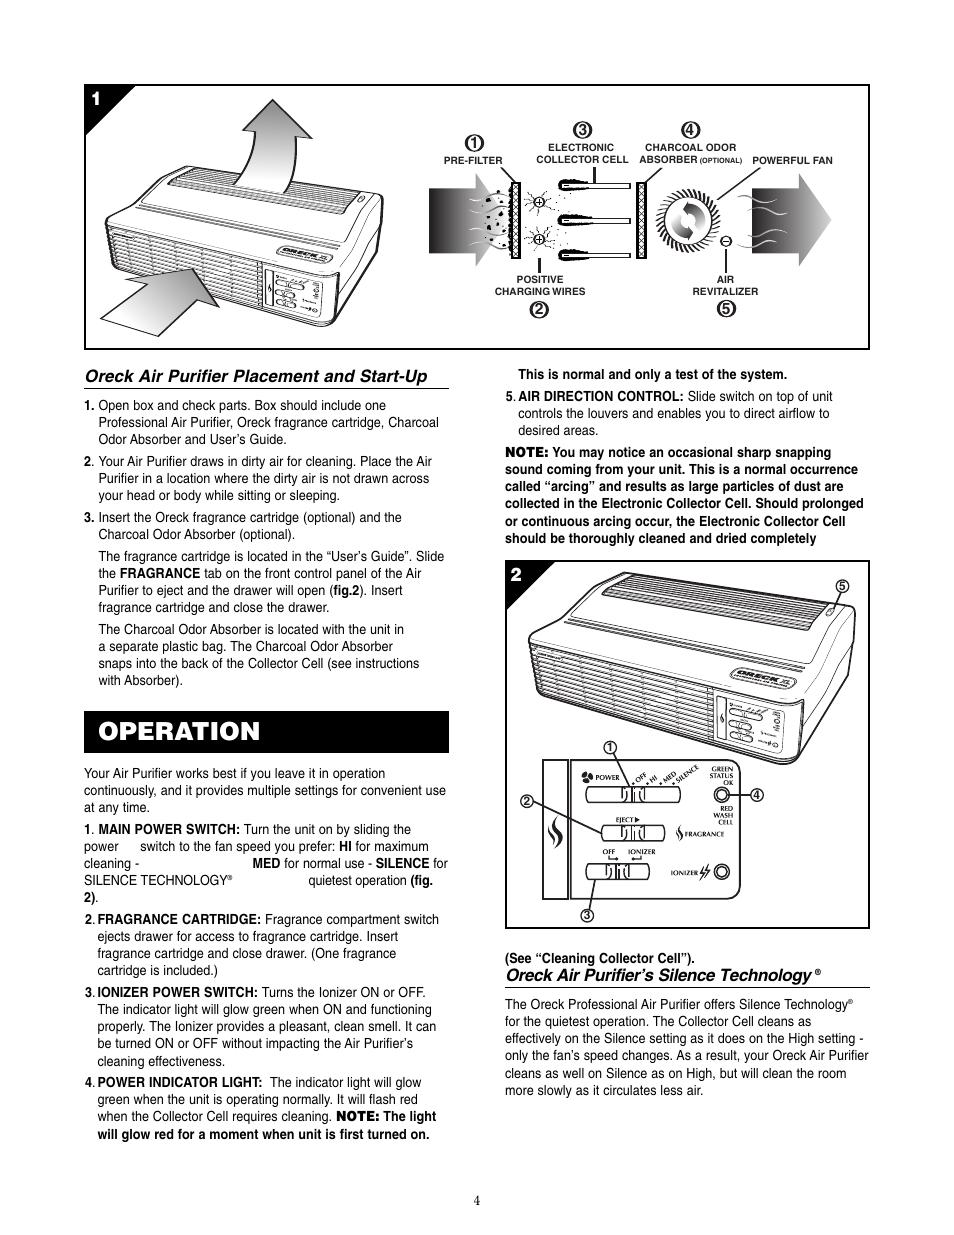 Oreck Xl Schematics Wiring Schematic Diagram Professional Air Purifier Manual Vacuum Switch